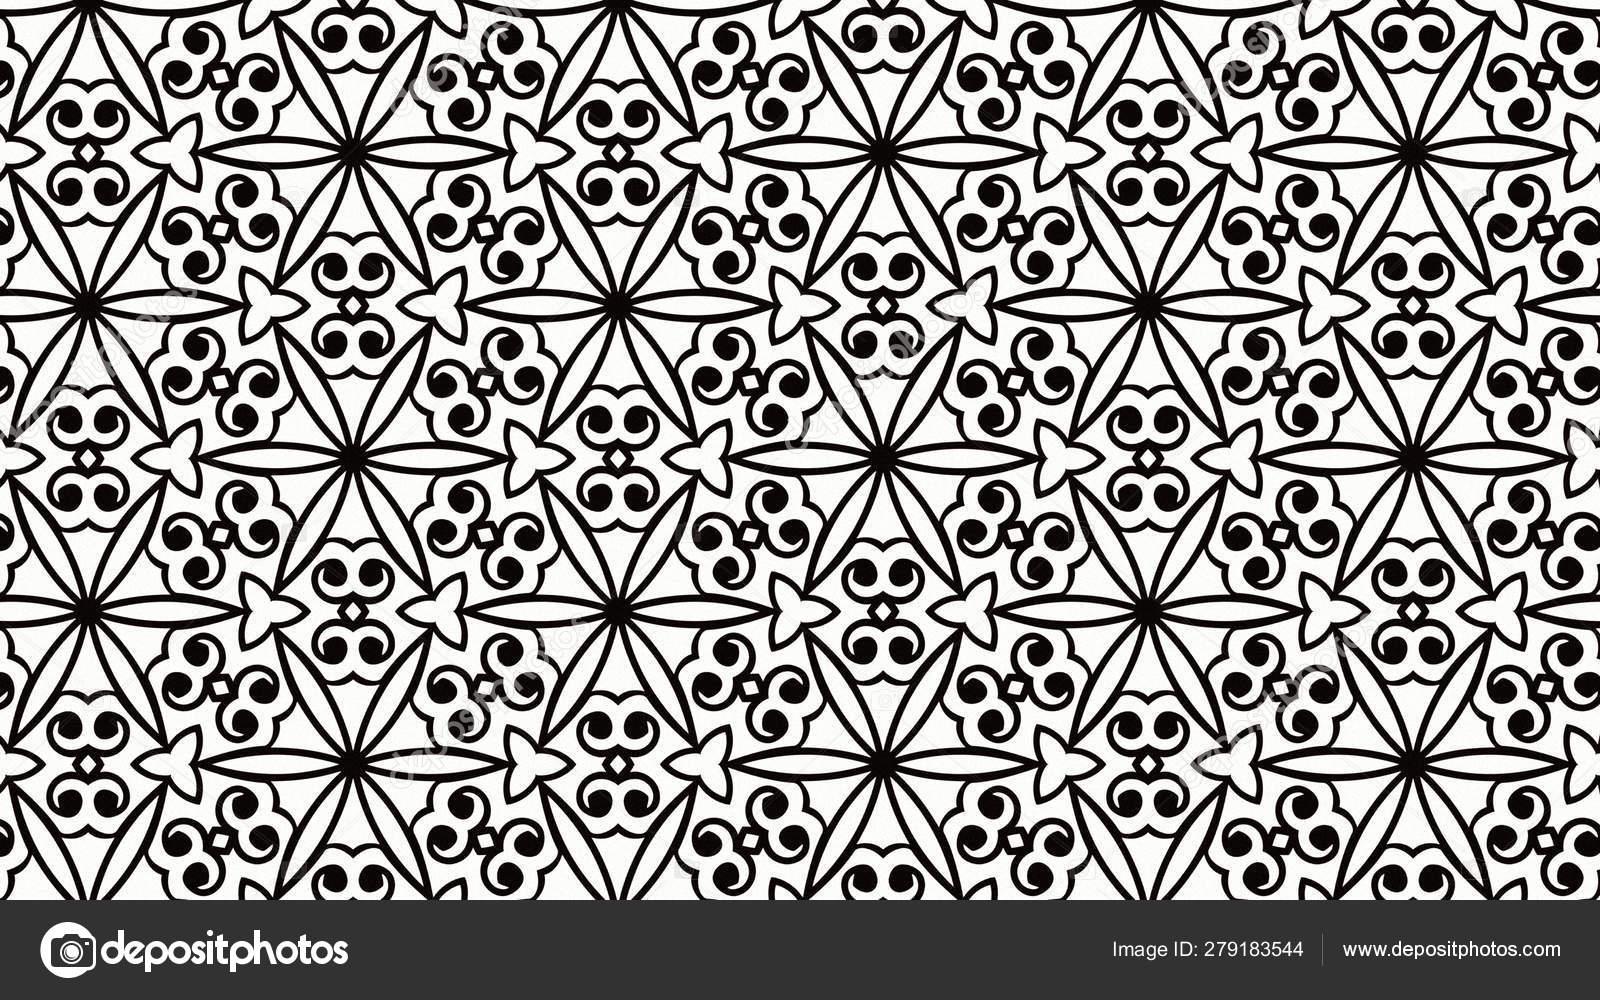 Black White Vintage Floral Pattern Wallpaper Beautiful Elegant